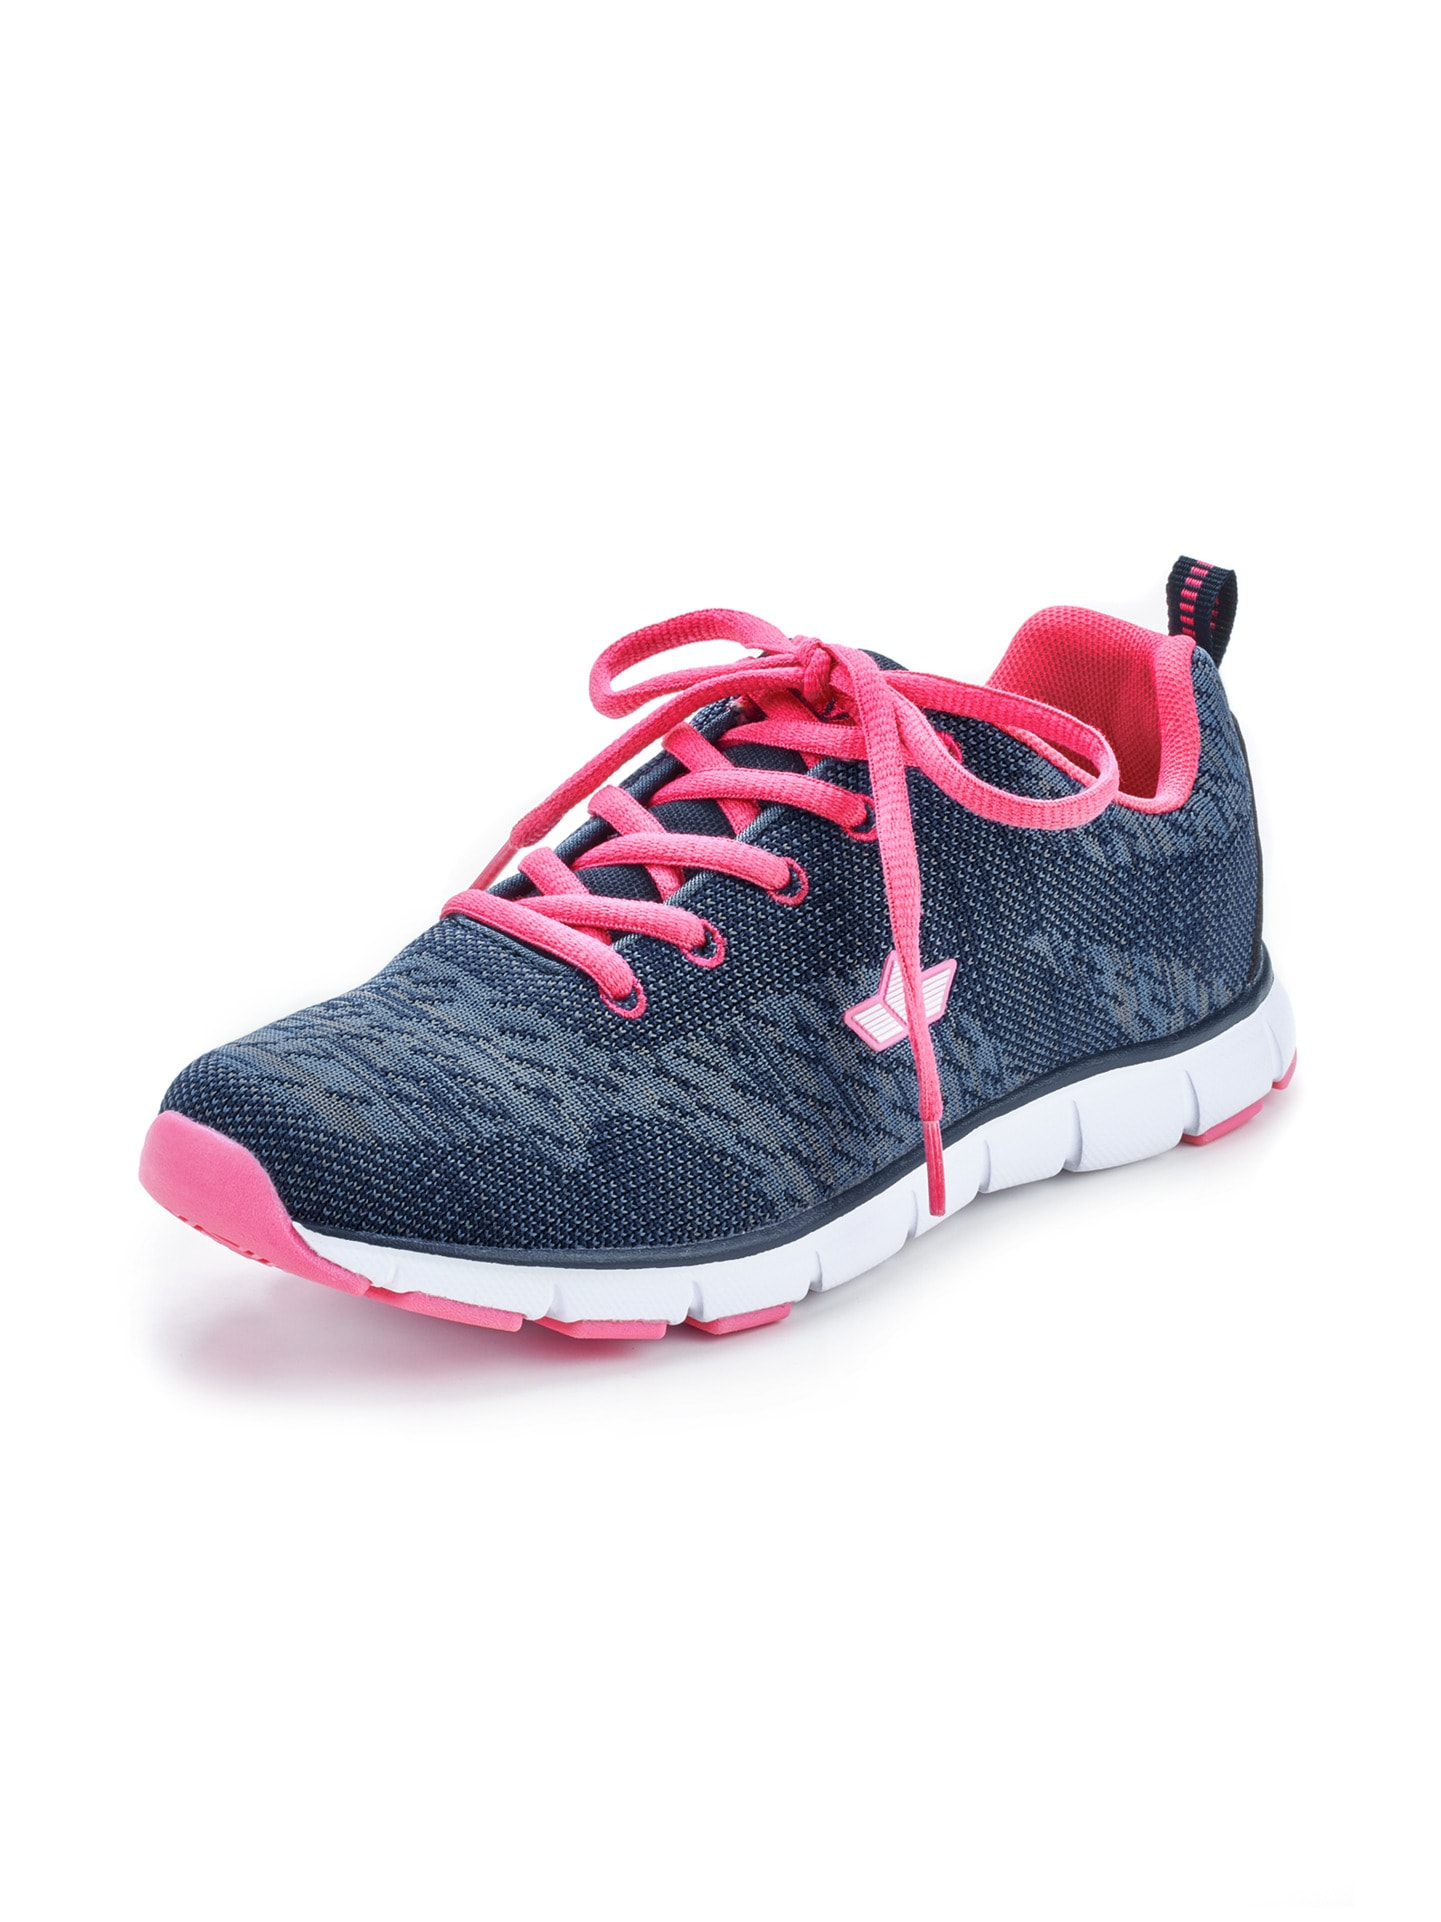 Avena Damen Ultra-Leicht-Sneaker Blau 45-7242-0